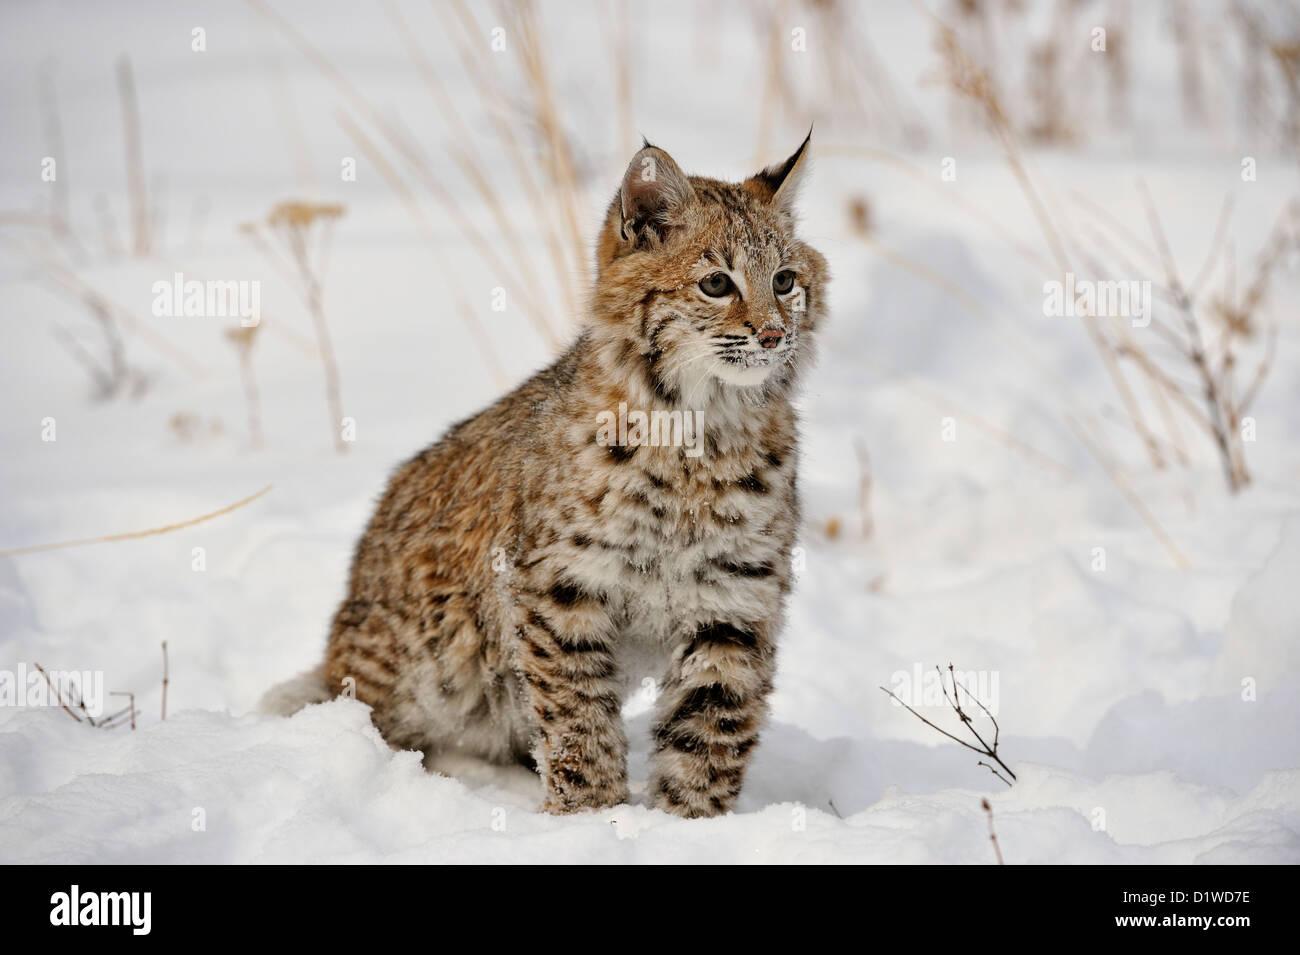 Bobcat (Lynx rufus) Kitten first winter, Bozeman, Montana, USA - Stock Image